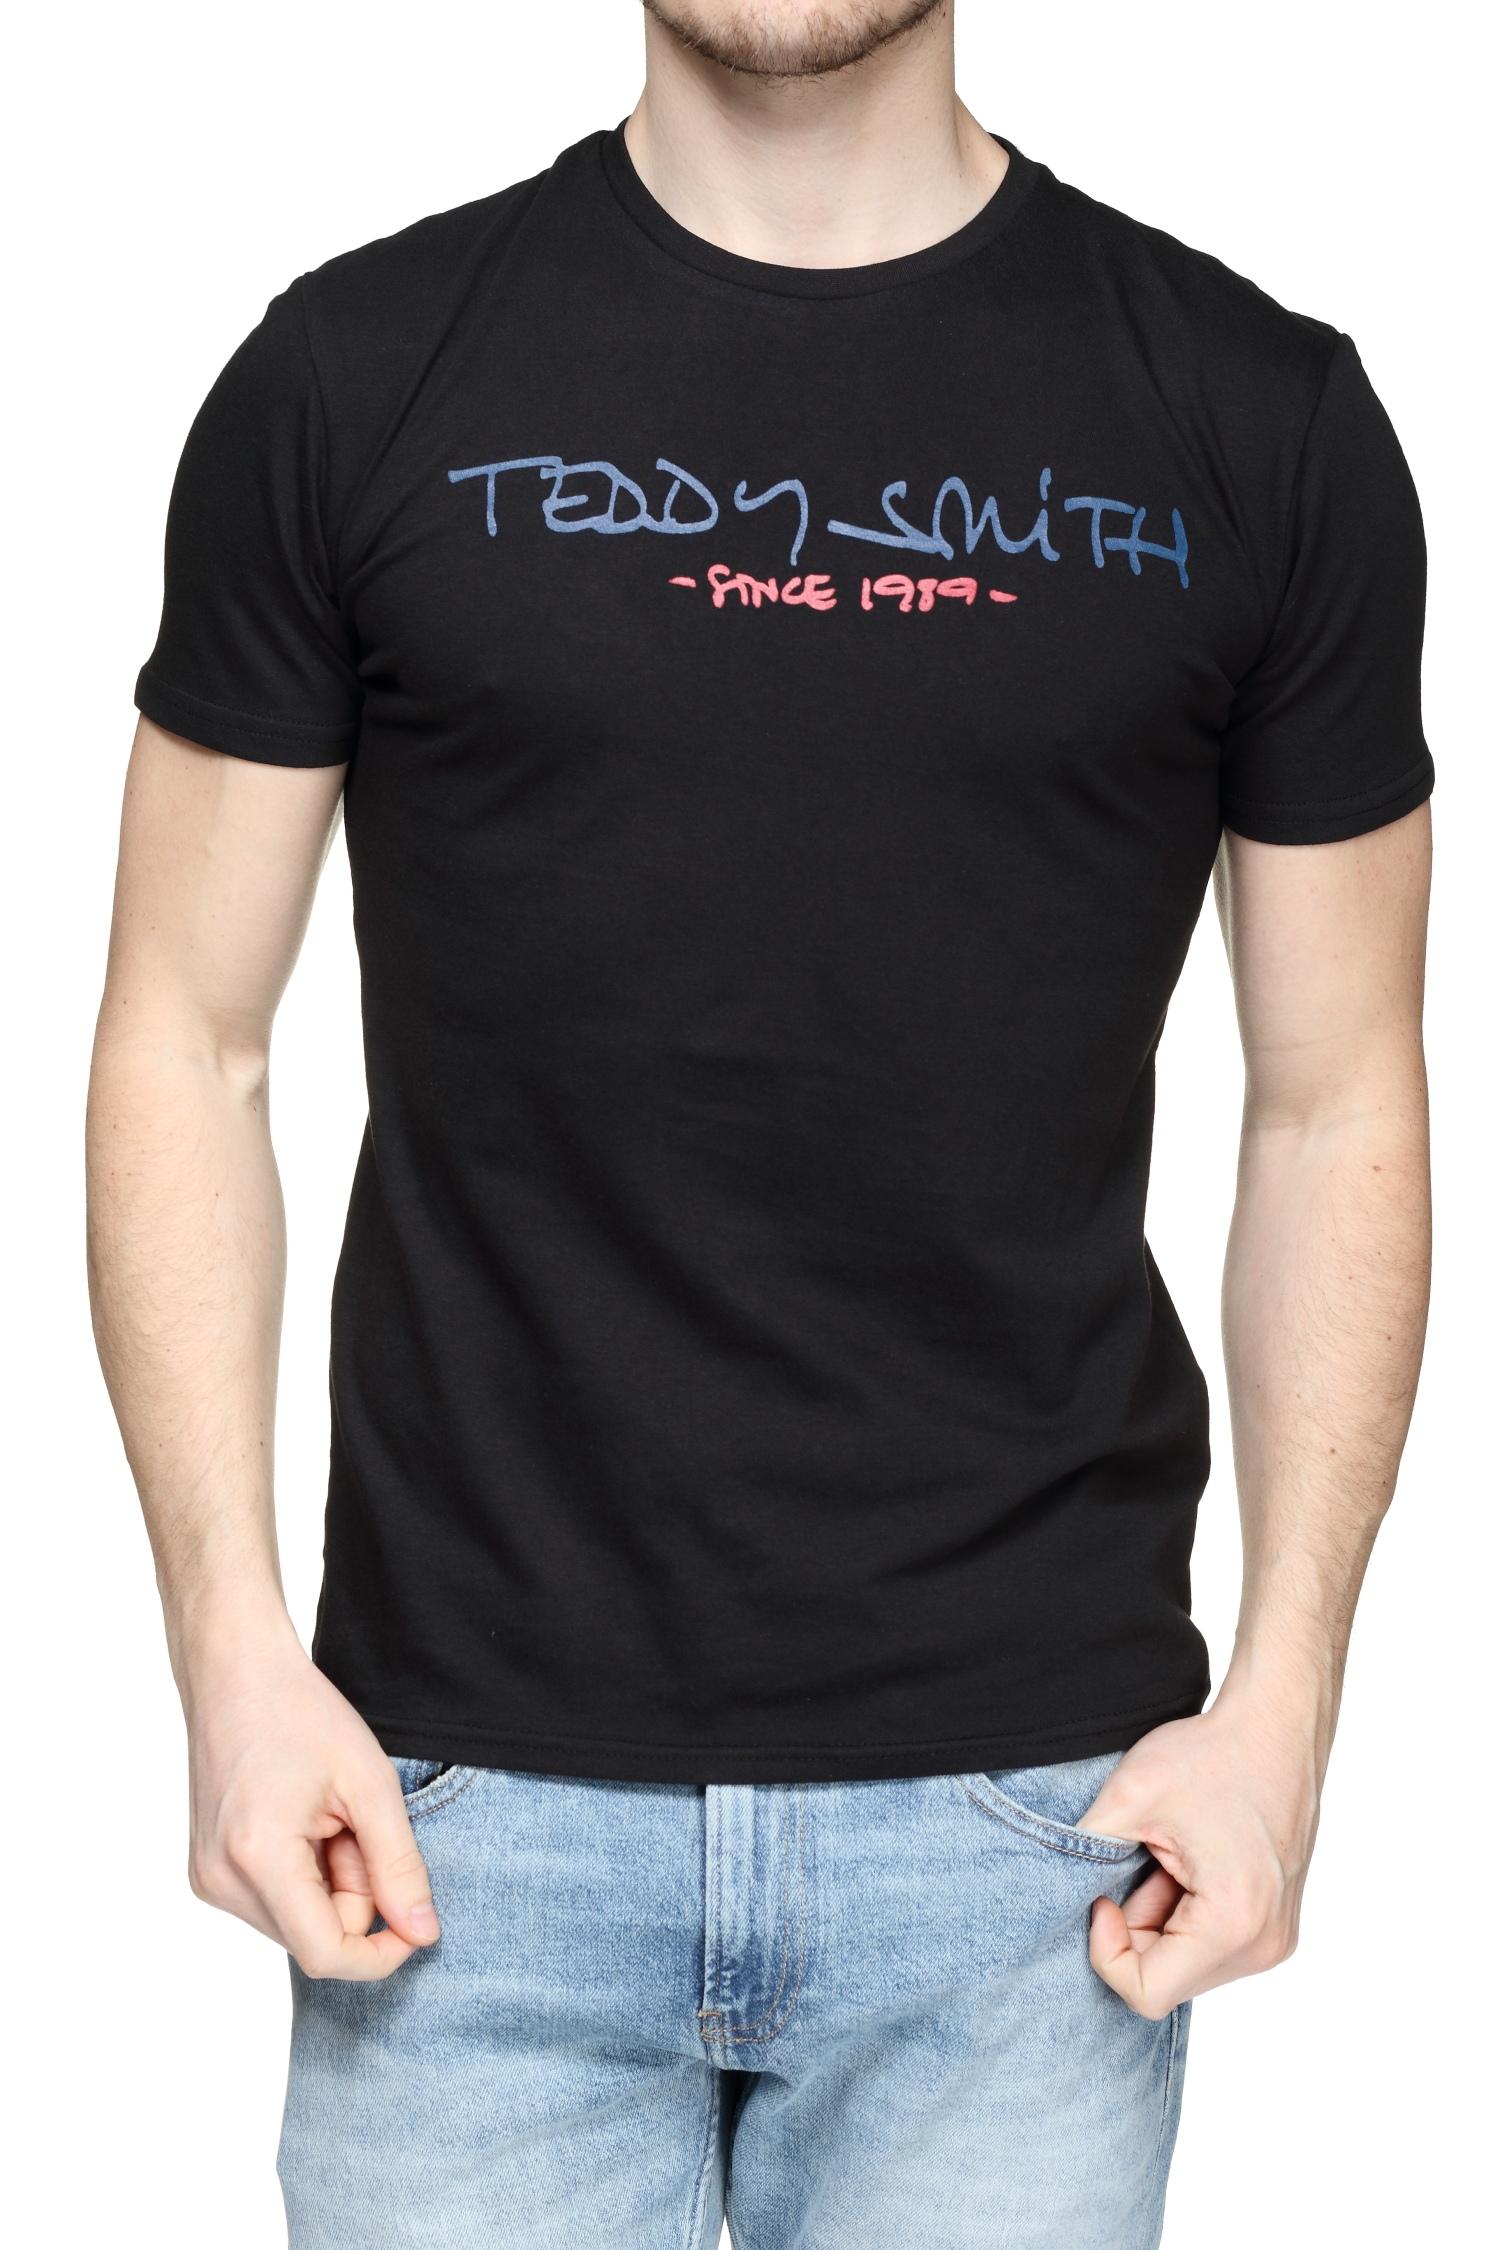 https://www.leadermode.com/185766/teddy-smith-ticlass-basic-11014744d-171-noir.jpg